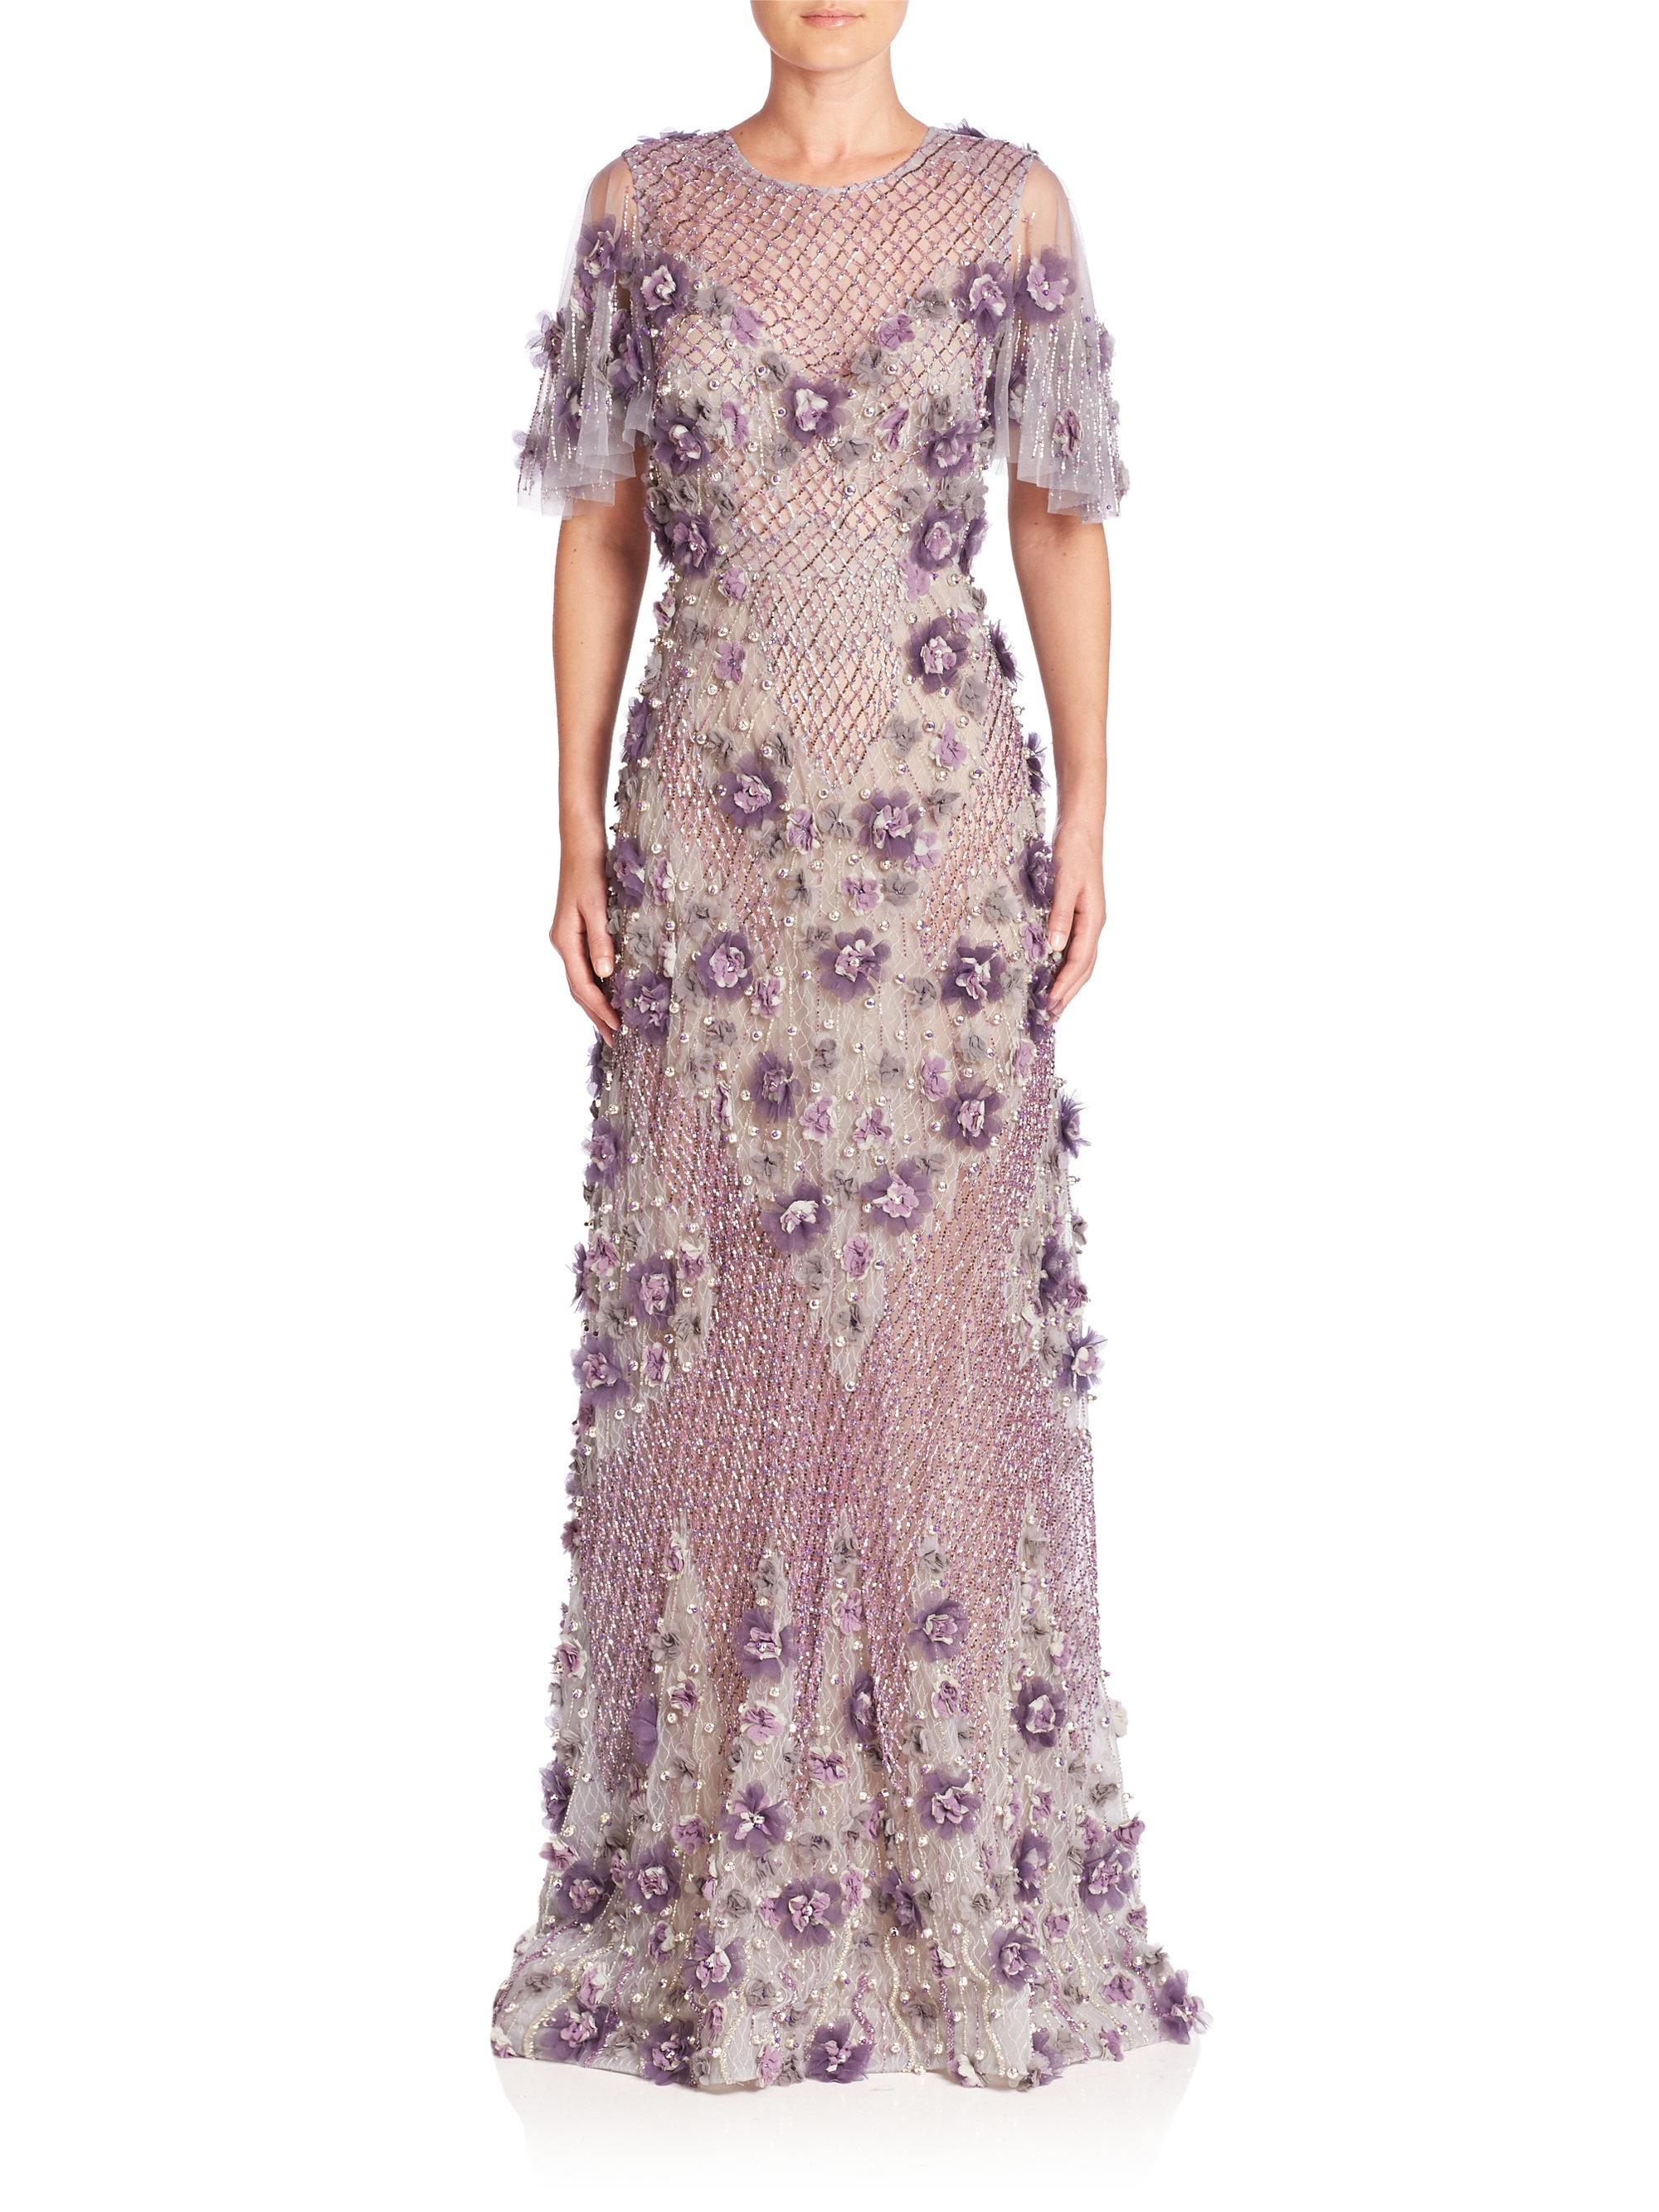 Lyst - Marchesa Embellished Drop Waist Ball Gown